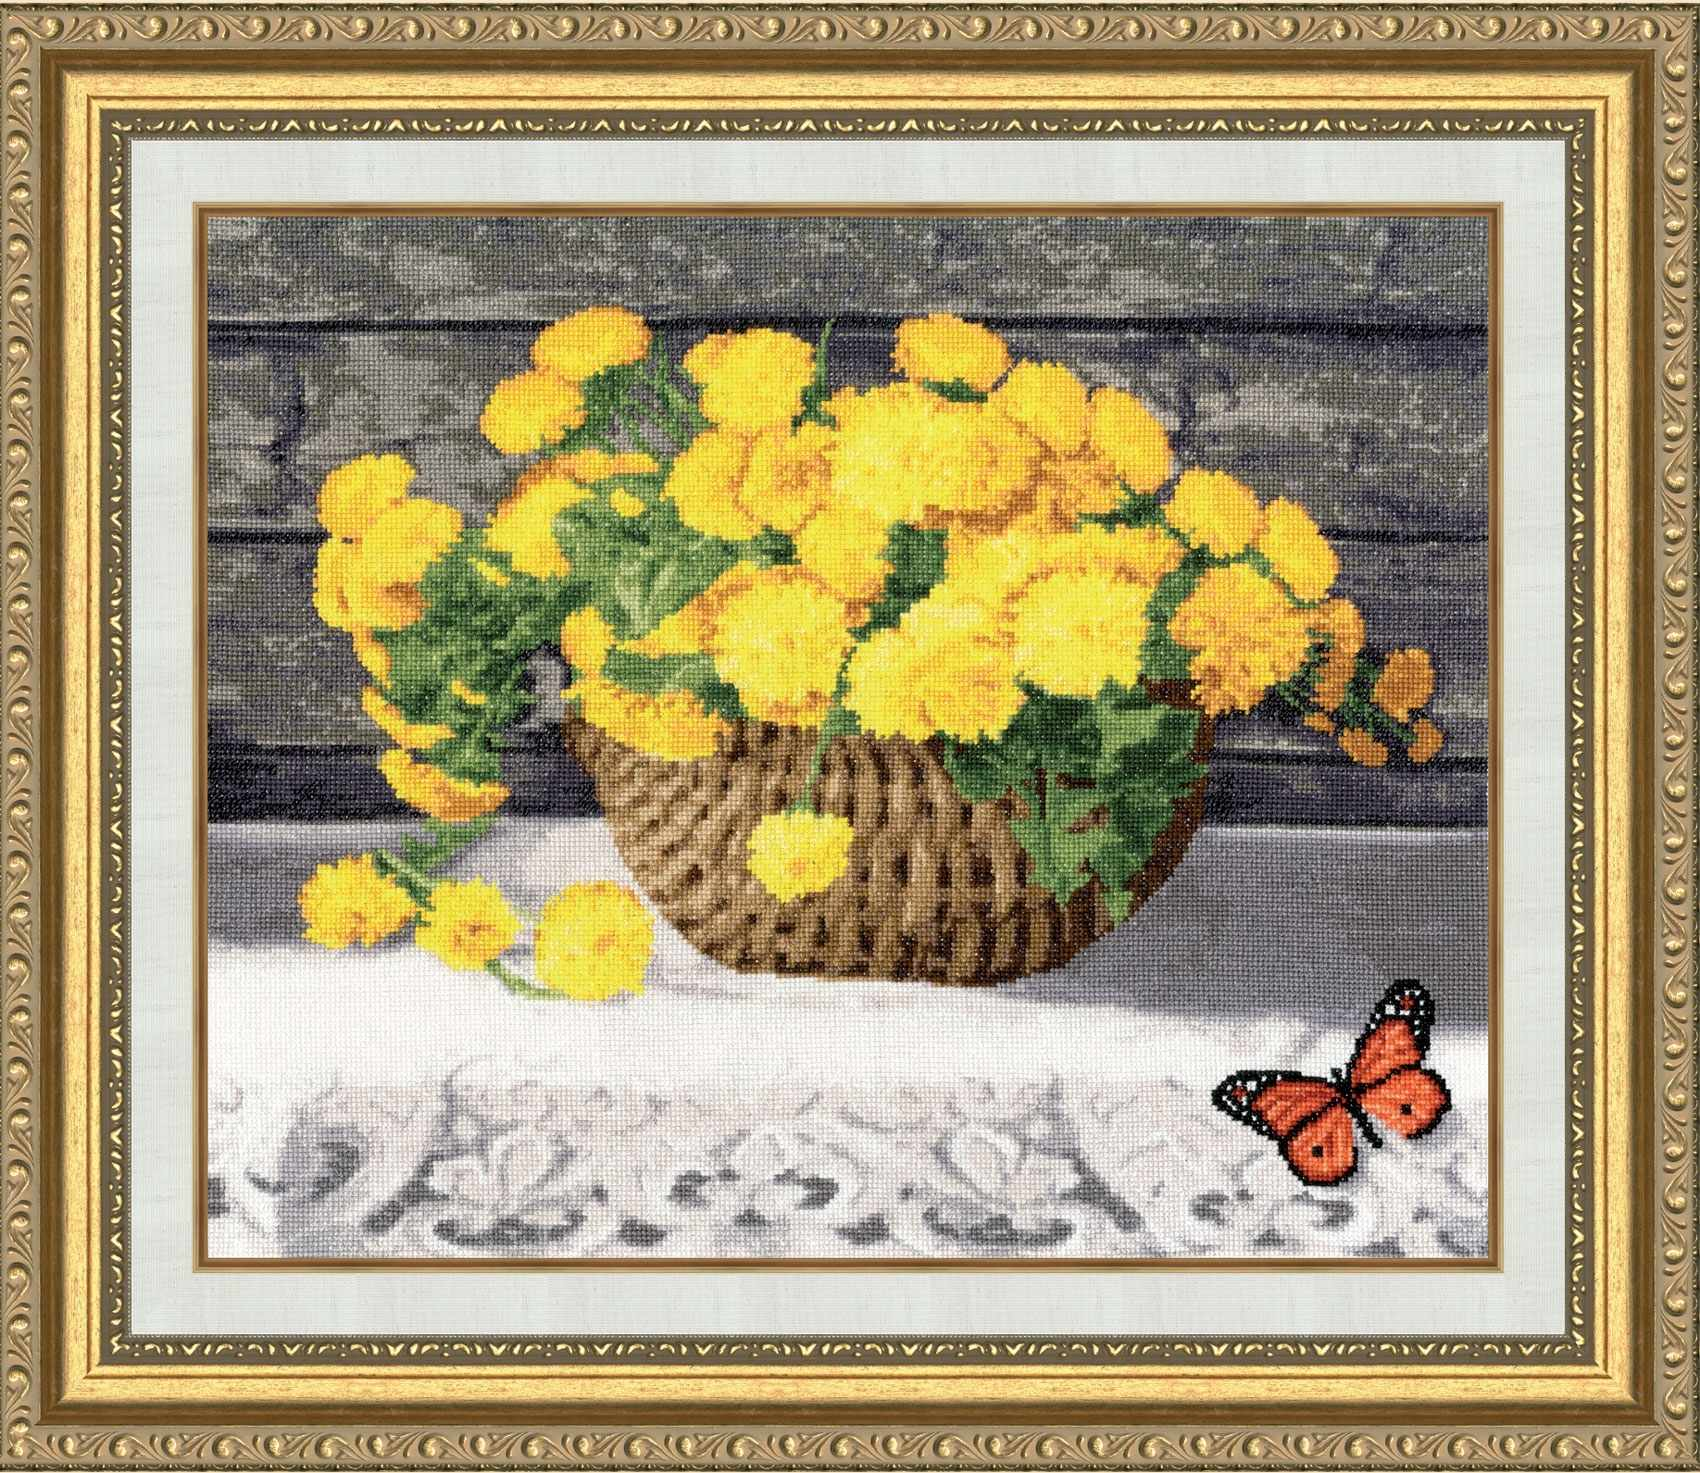 ЛЦ-051 Солнце в цветах. Любимые цветы